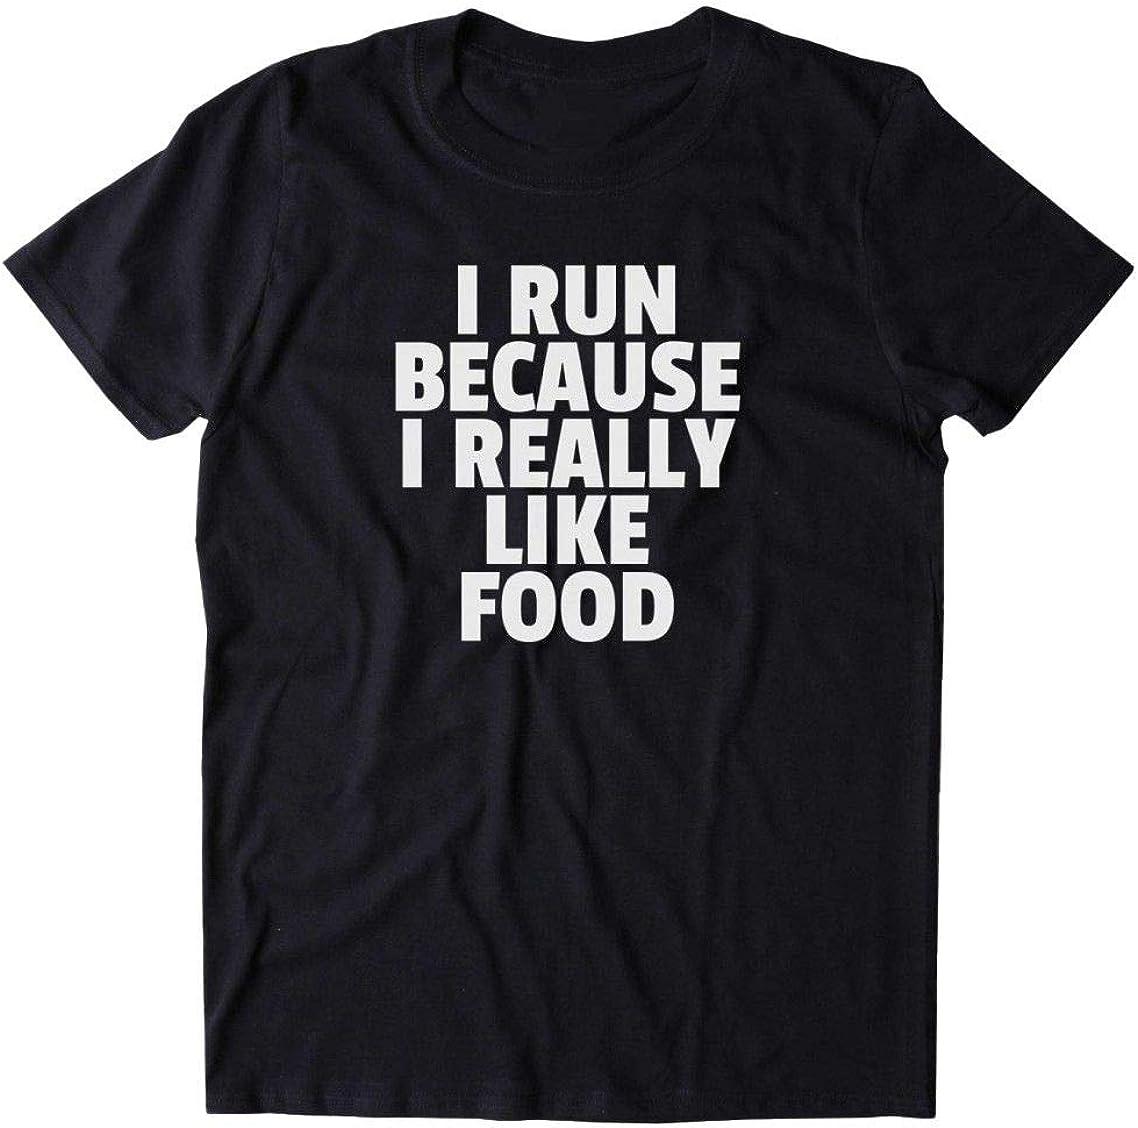 Aonani & Partner I-Run-Because-I-Really-Like-Food-Shirt-Funny-Running-Work-Out-Gym-Exercise-ClothingT-Shirt-Size-Guid